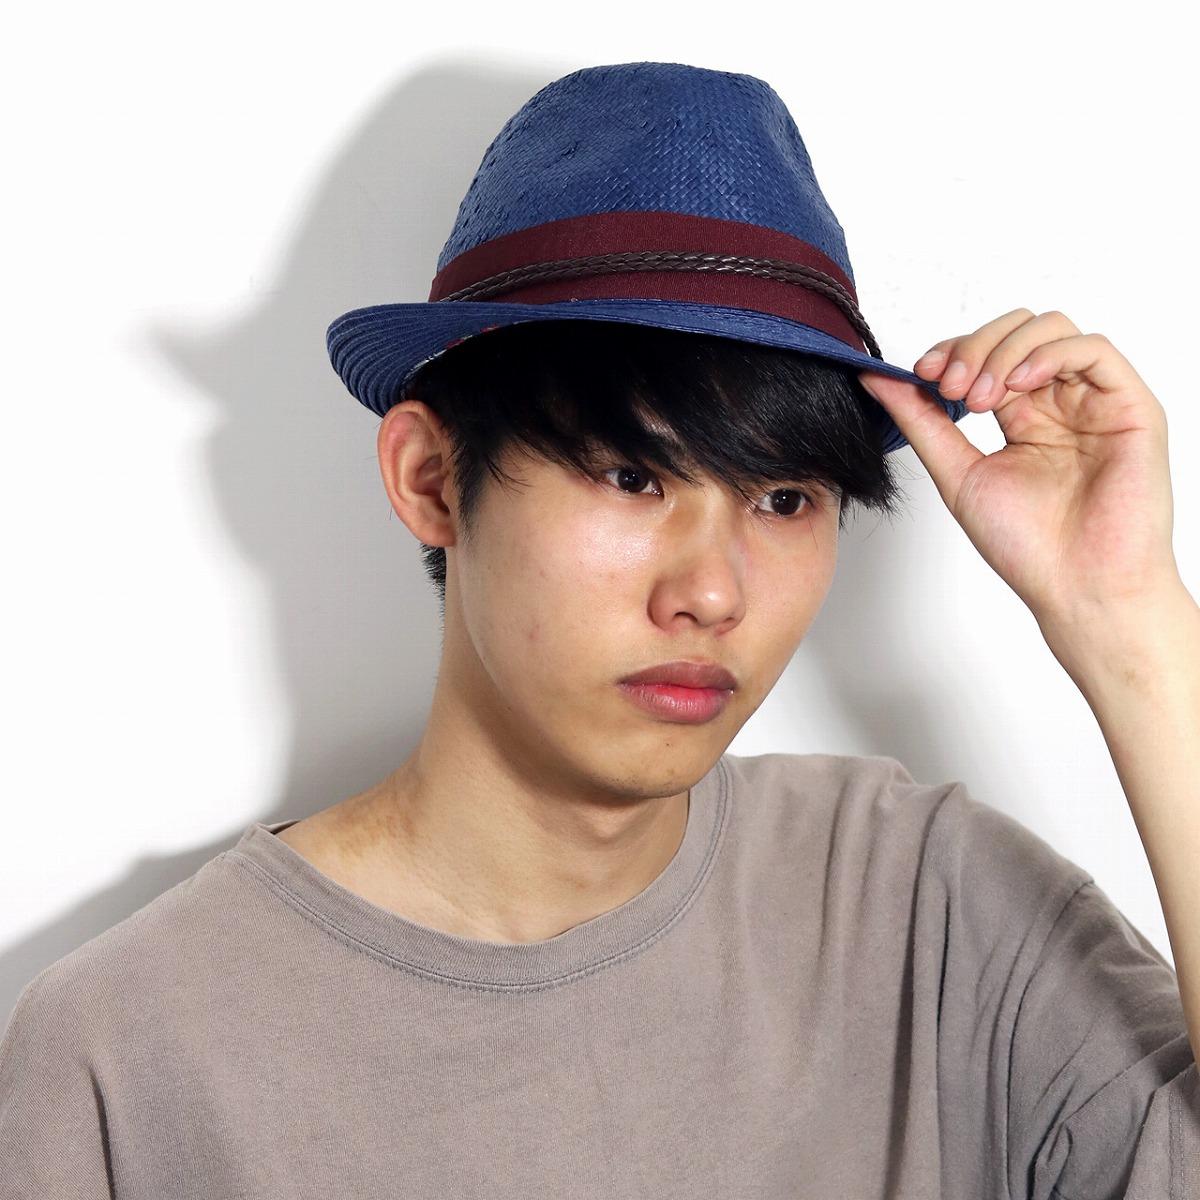 209350ed6fa CARLOS SANTANA hat men s cool casual paper material Lady s soft felt hat  Carlos Santana straw hat ...